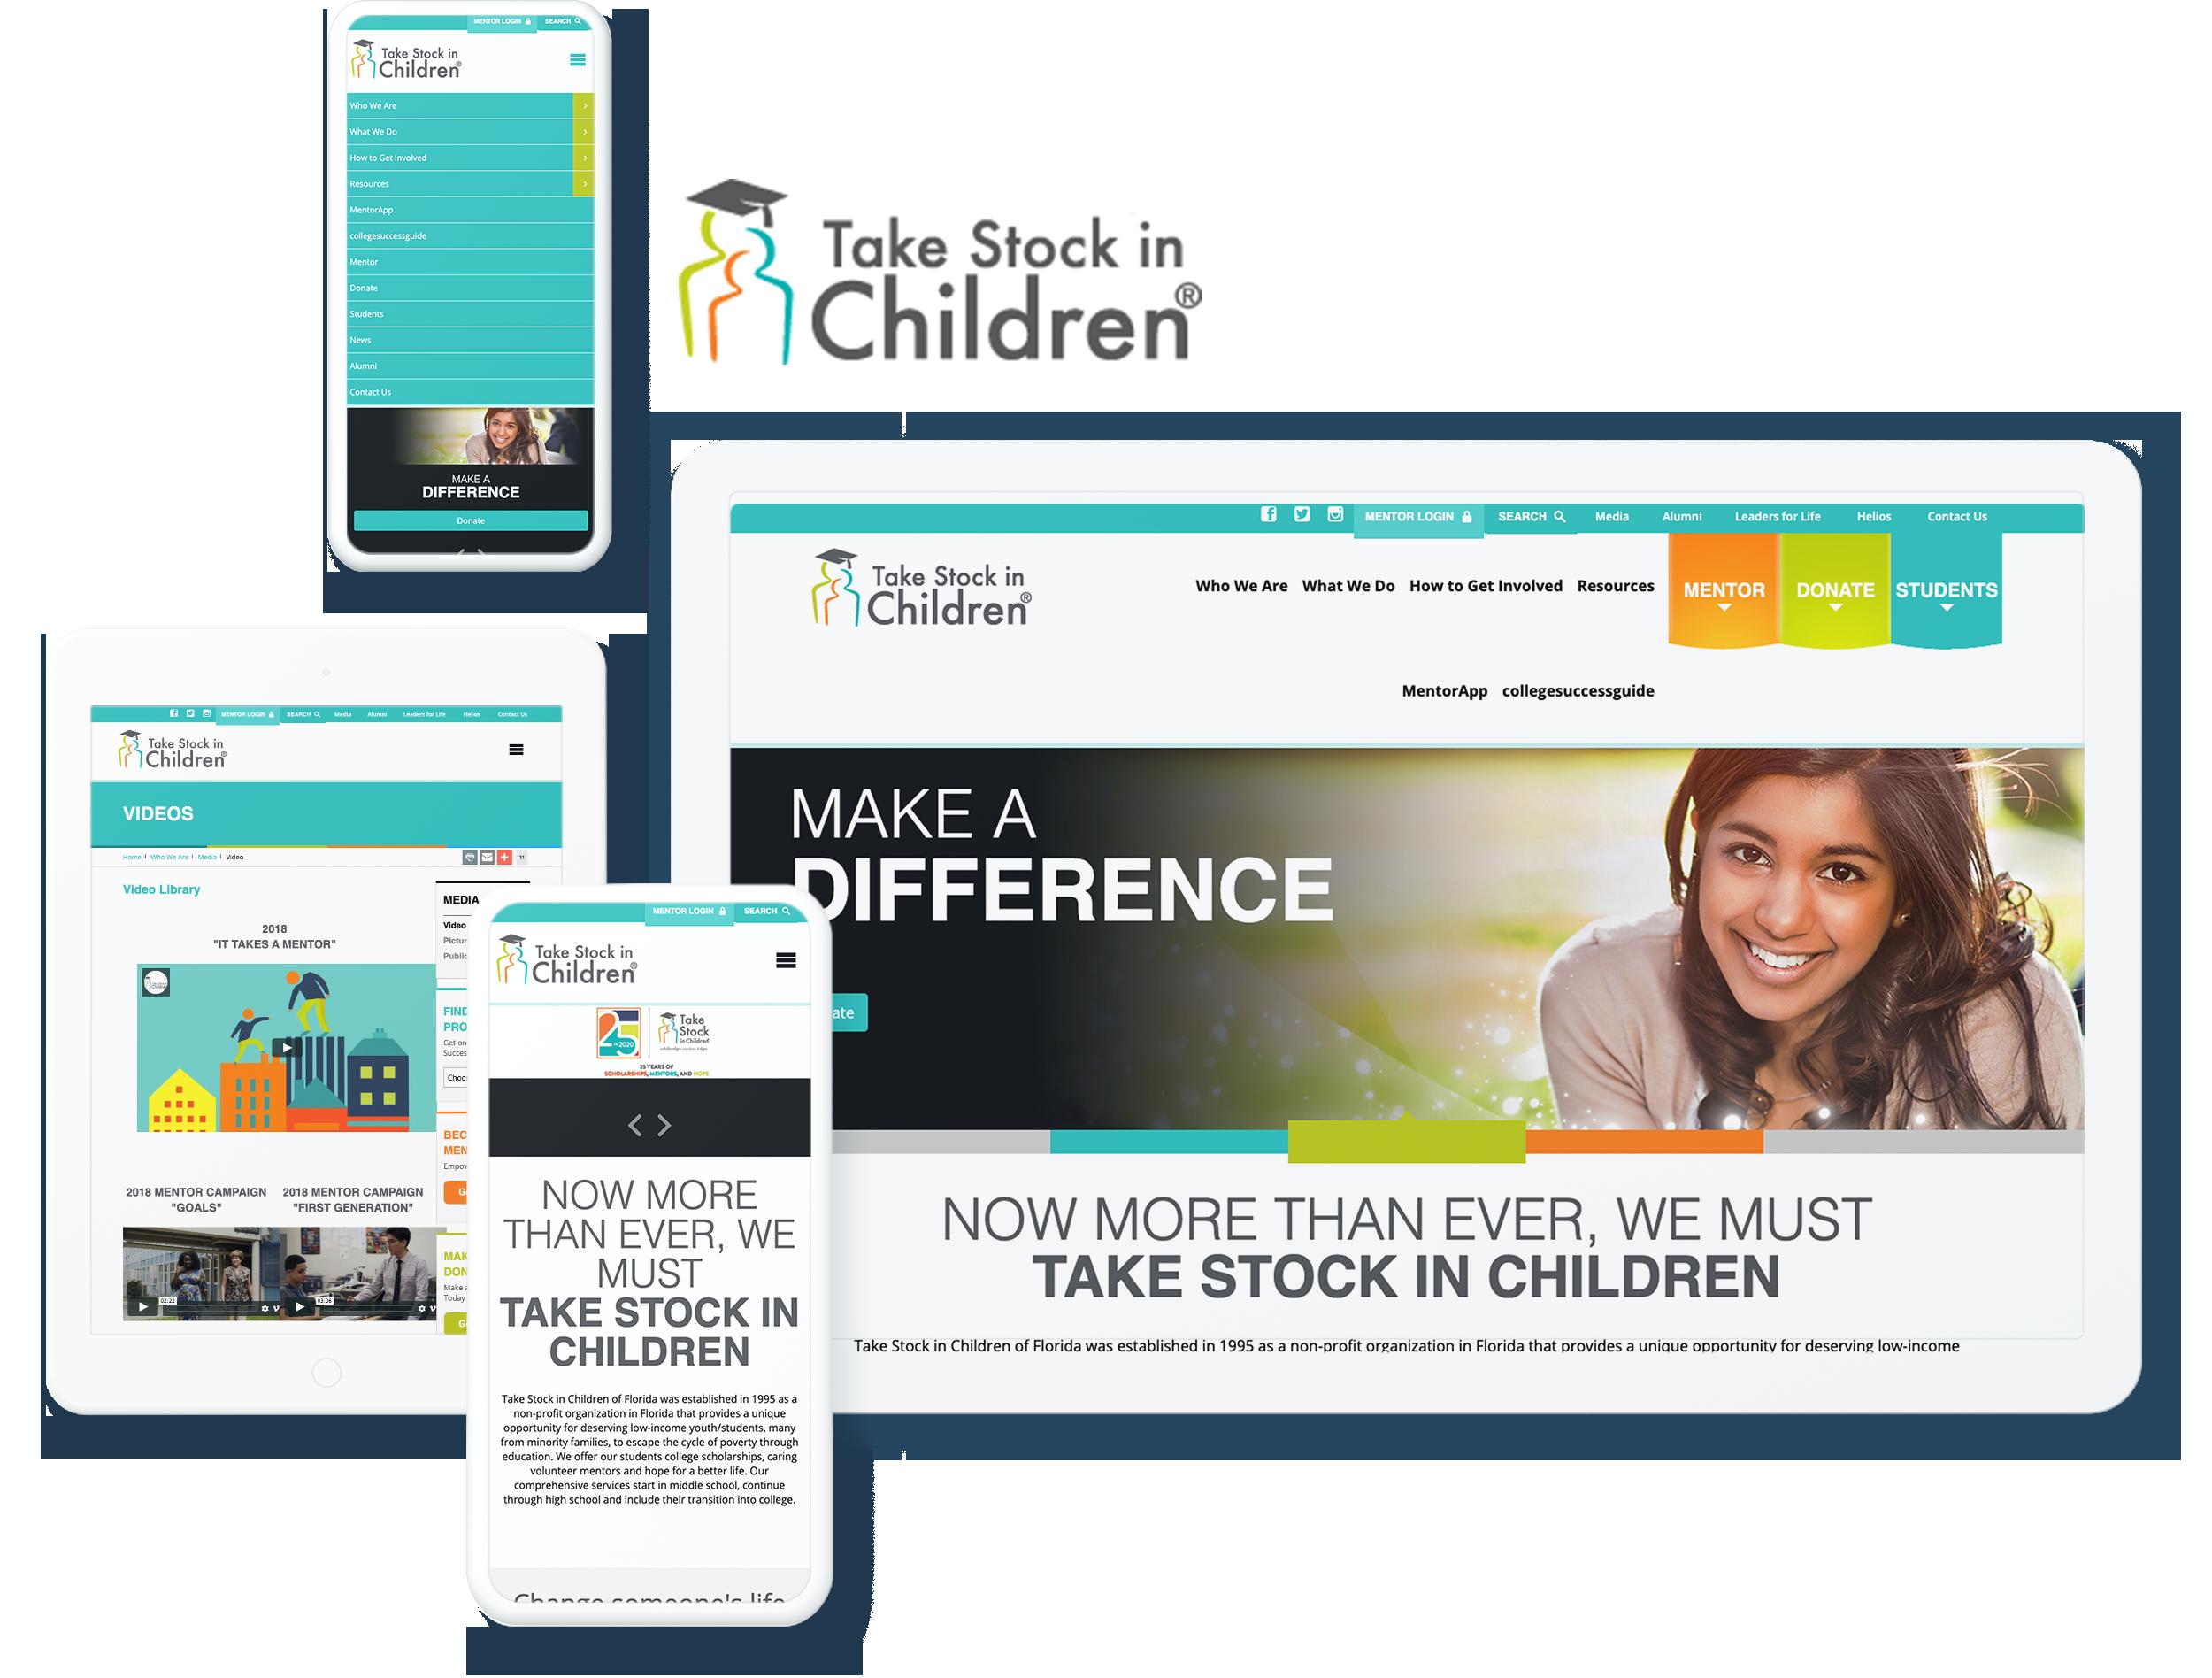 TAKE STOCK IN CHILDREN SCREENS